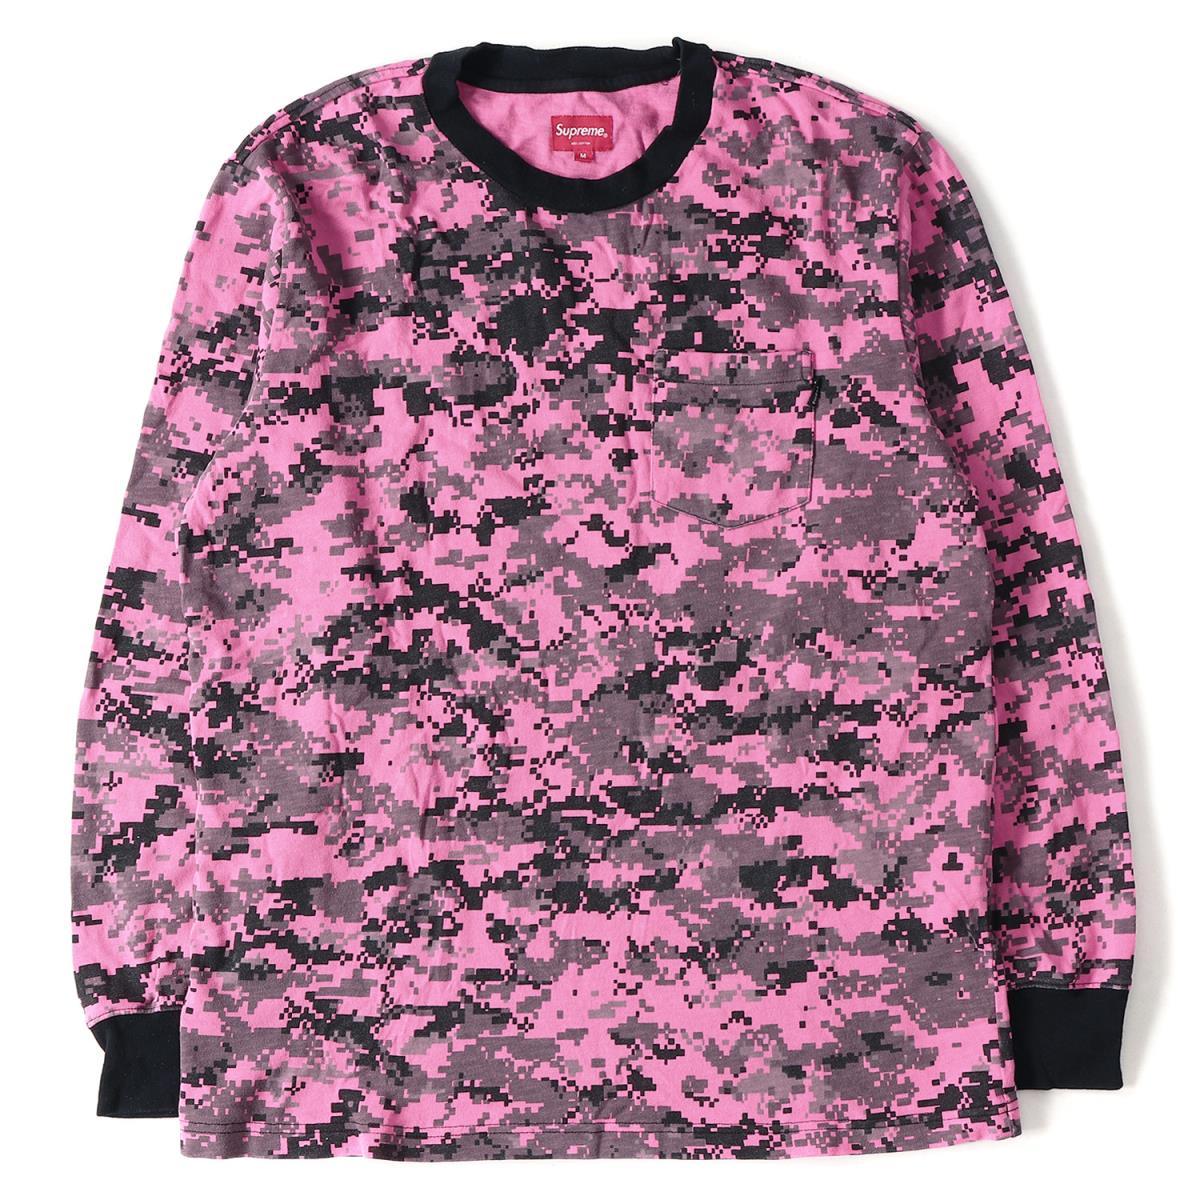 Supreme (シュプリーム) 17A/W ポケット付きヘビーウエイトロングスリーブTシャツ(L/S Pocket Tee) ピンクデジカモ M 【メンズ】【K2114】【中古】【あす楽☆対応可】